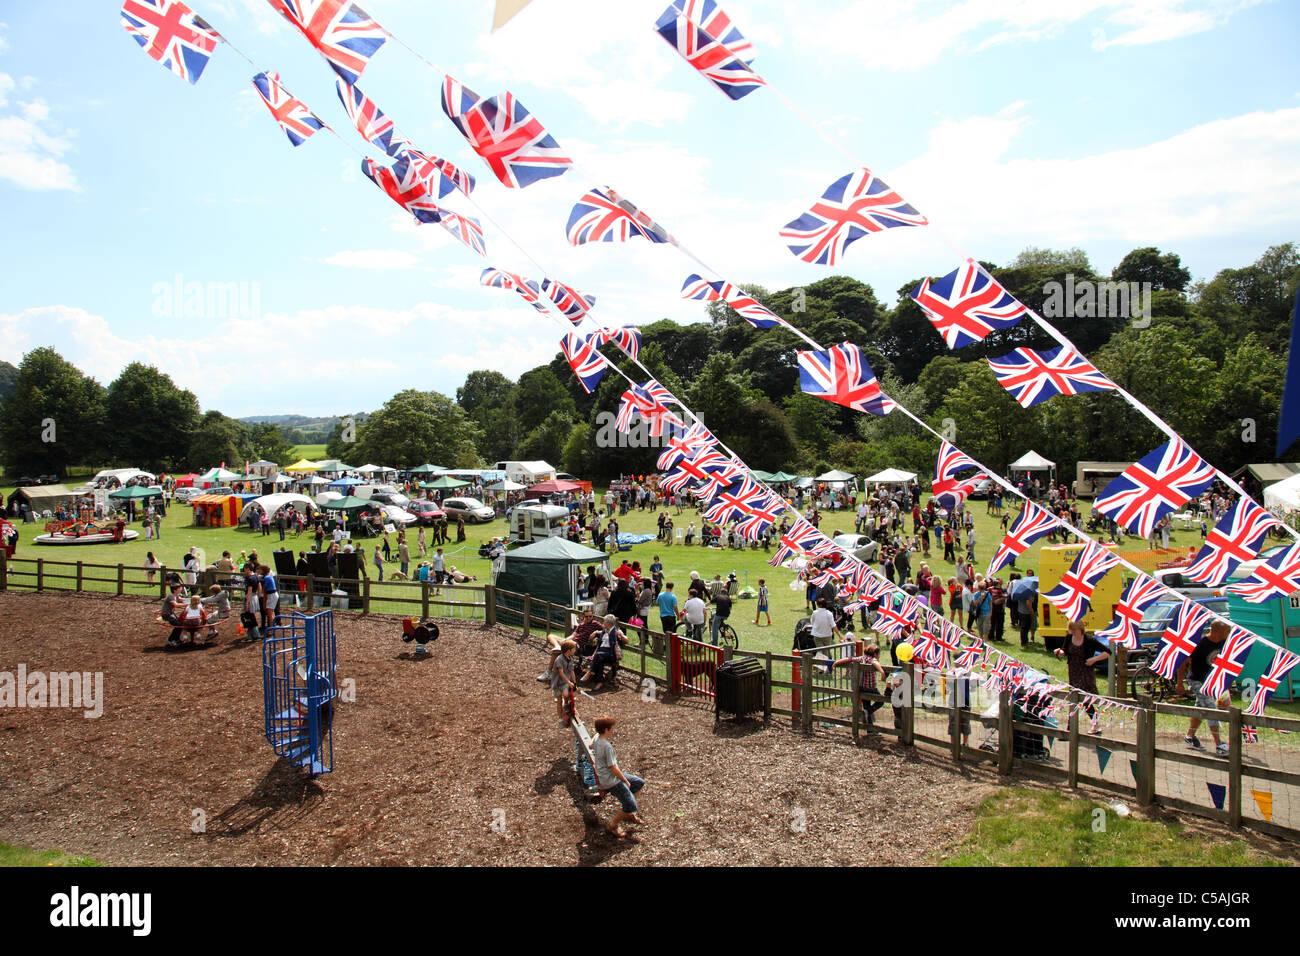 A village fete in Derbyshire, England, U.K. - Stock Image